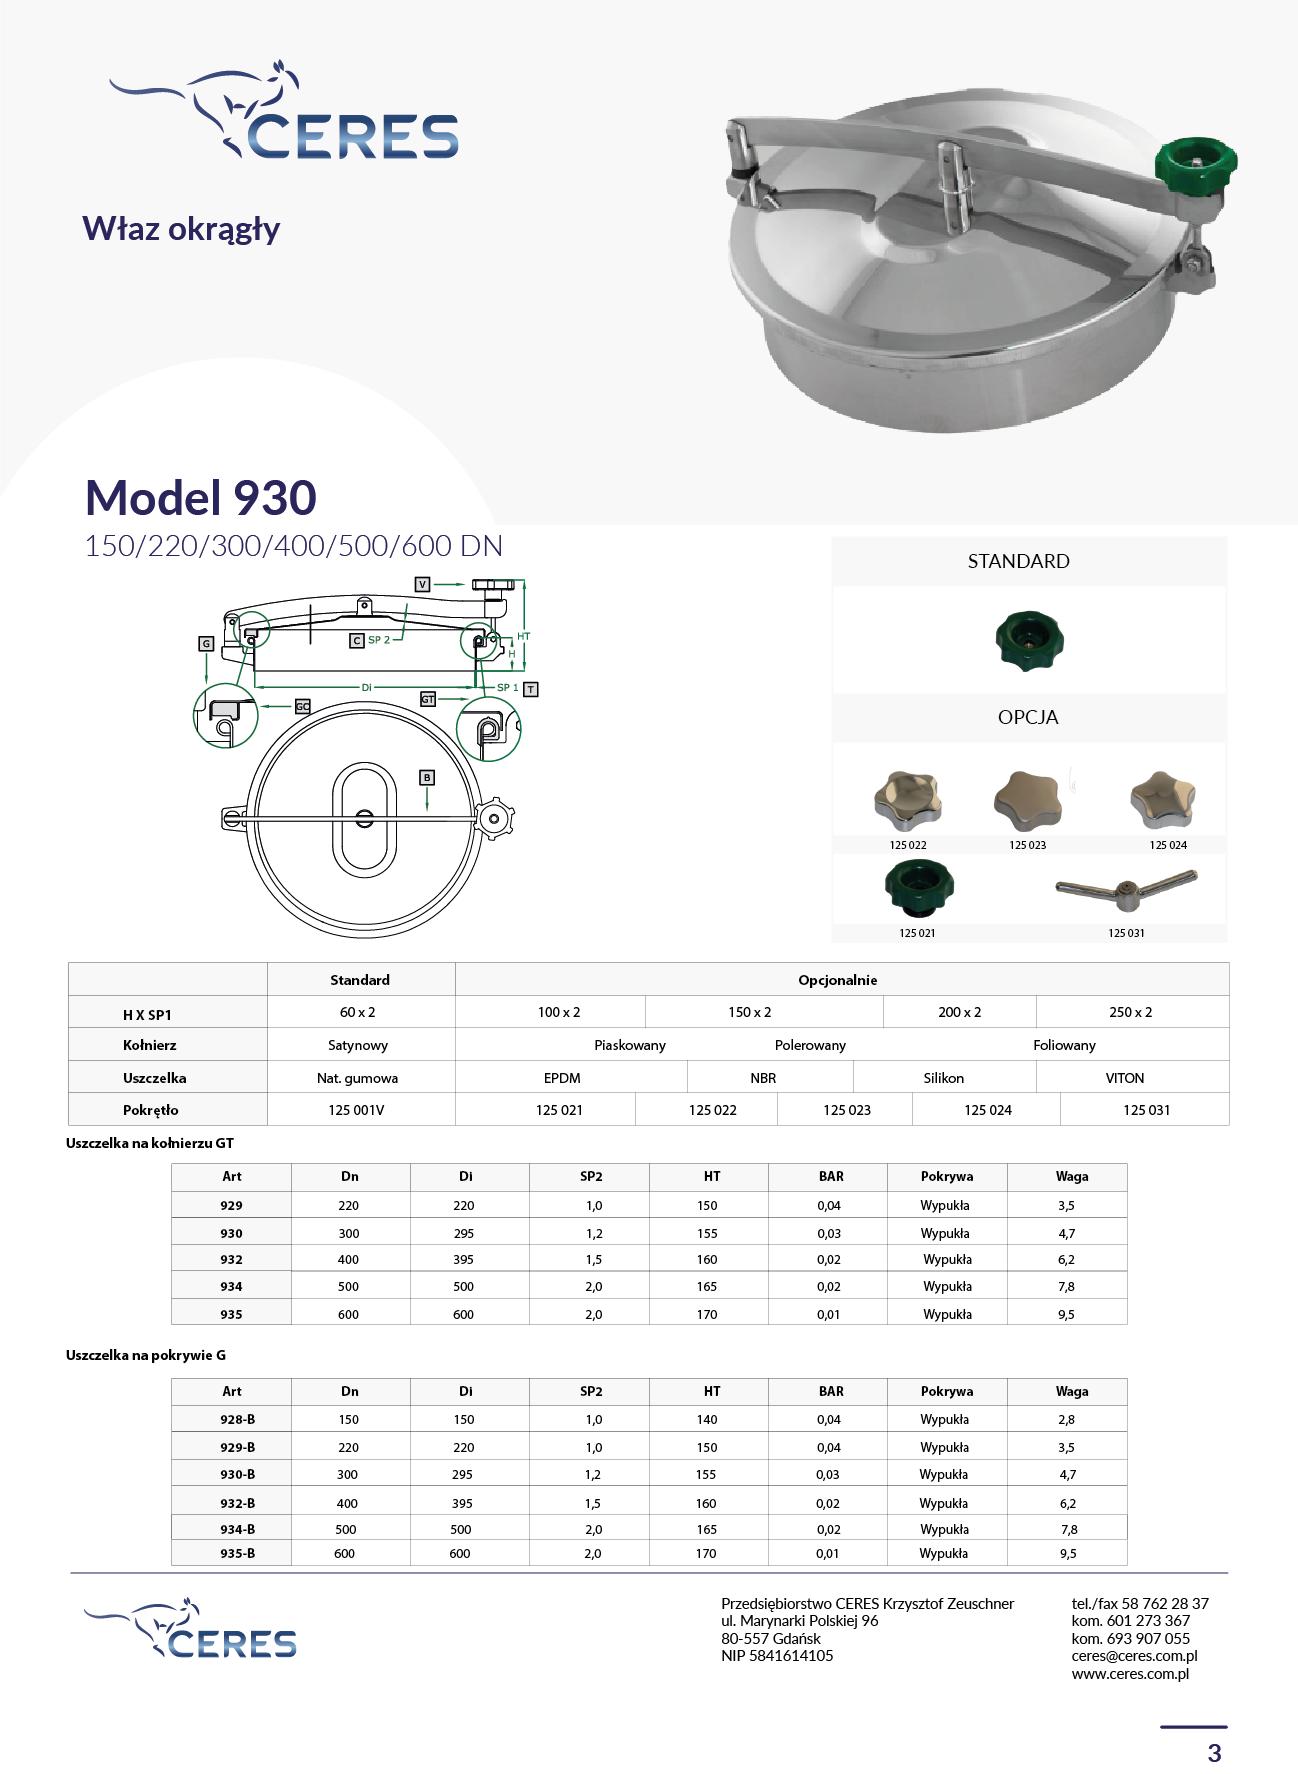 MODEL 930